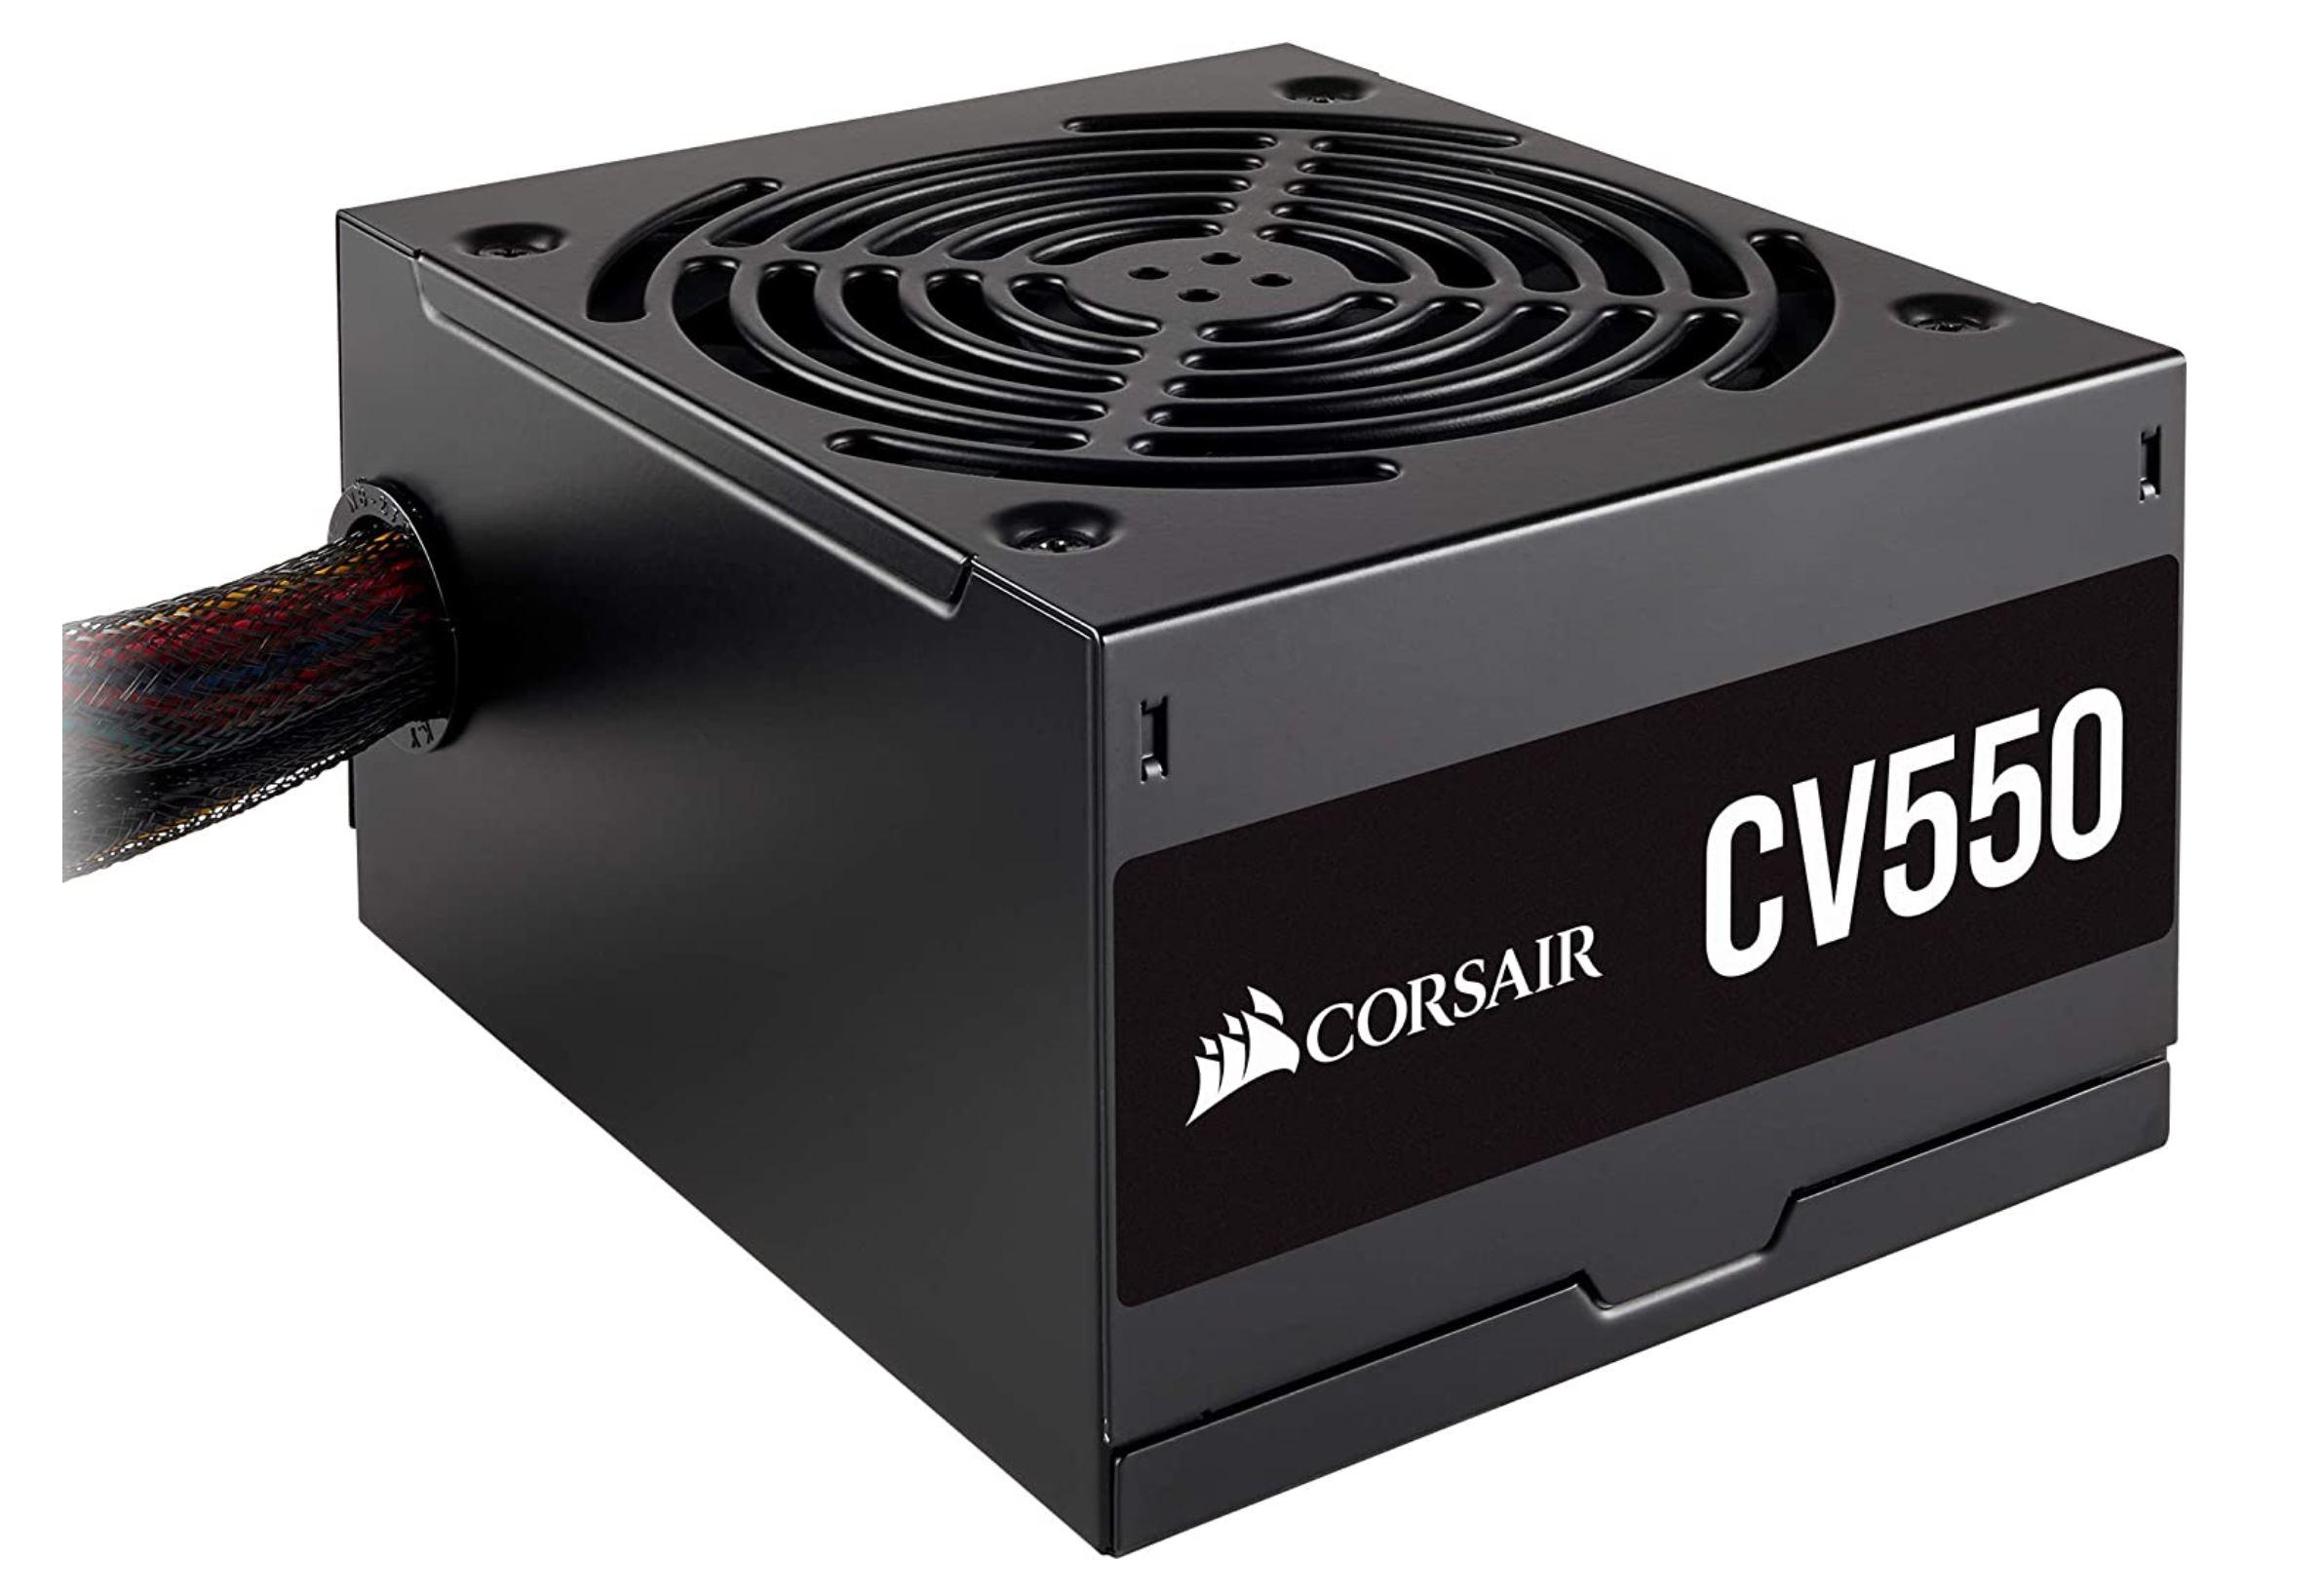 Corsair CV550 PC-voeding 550Watt